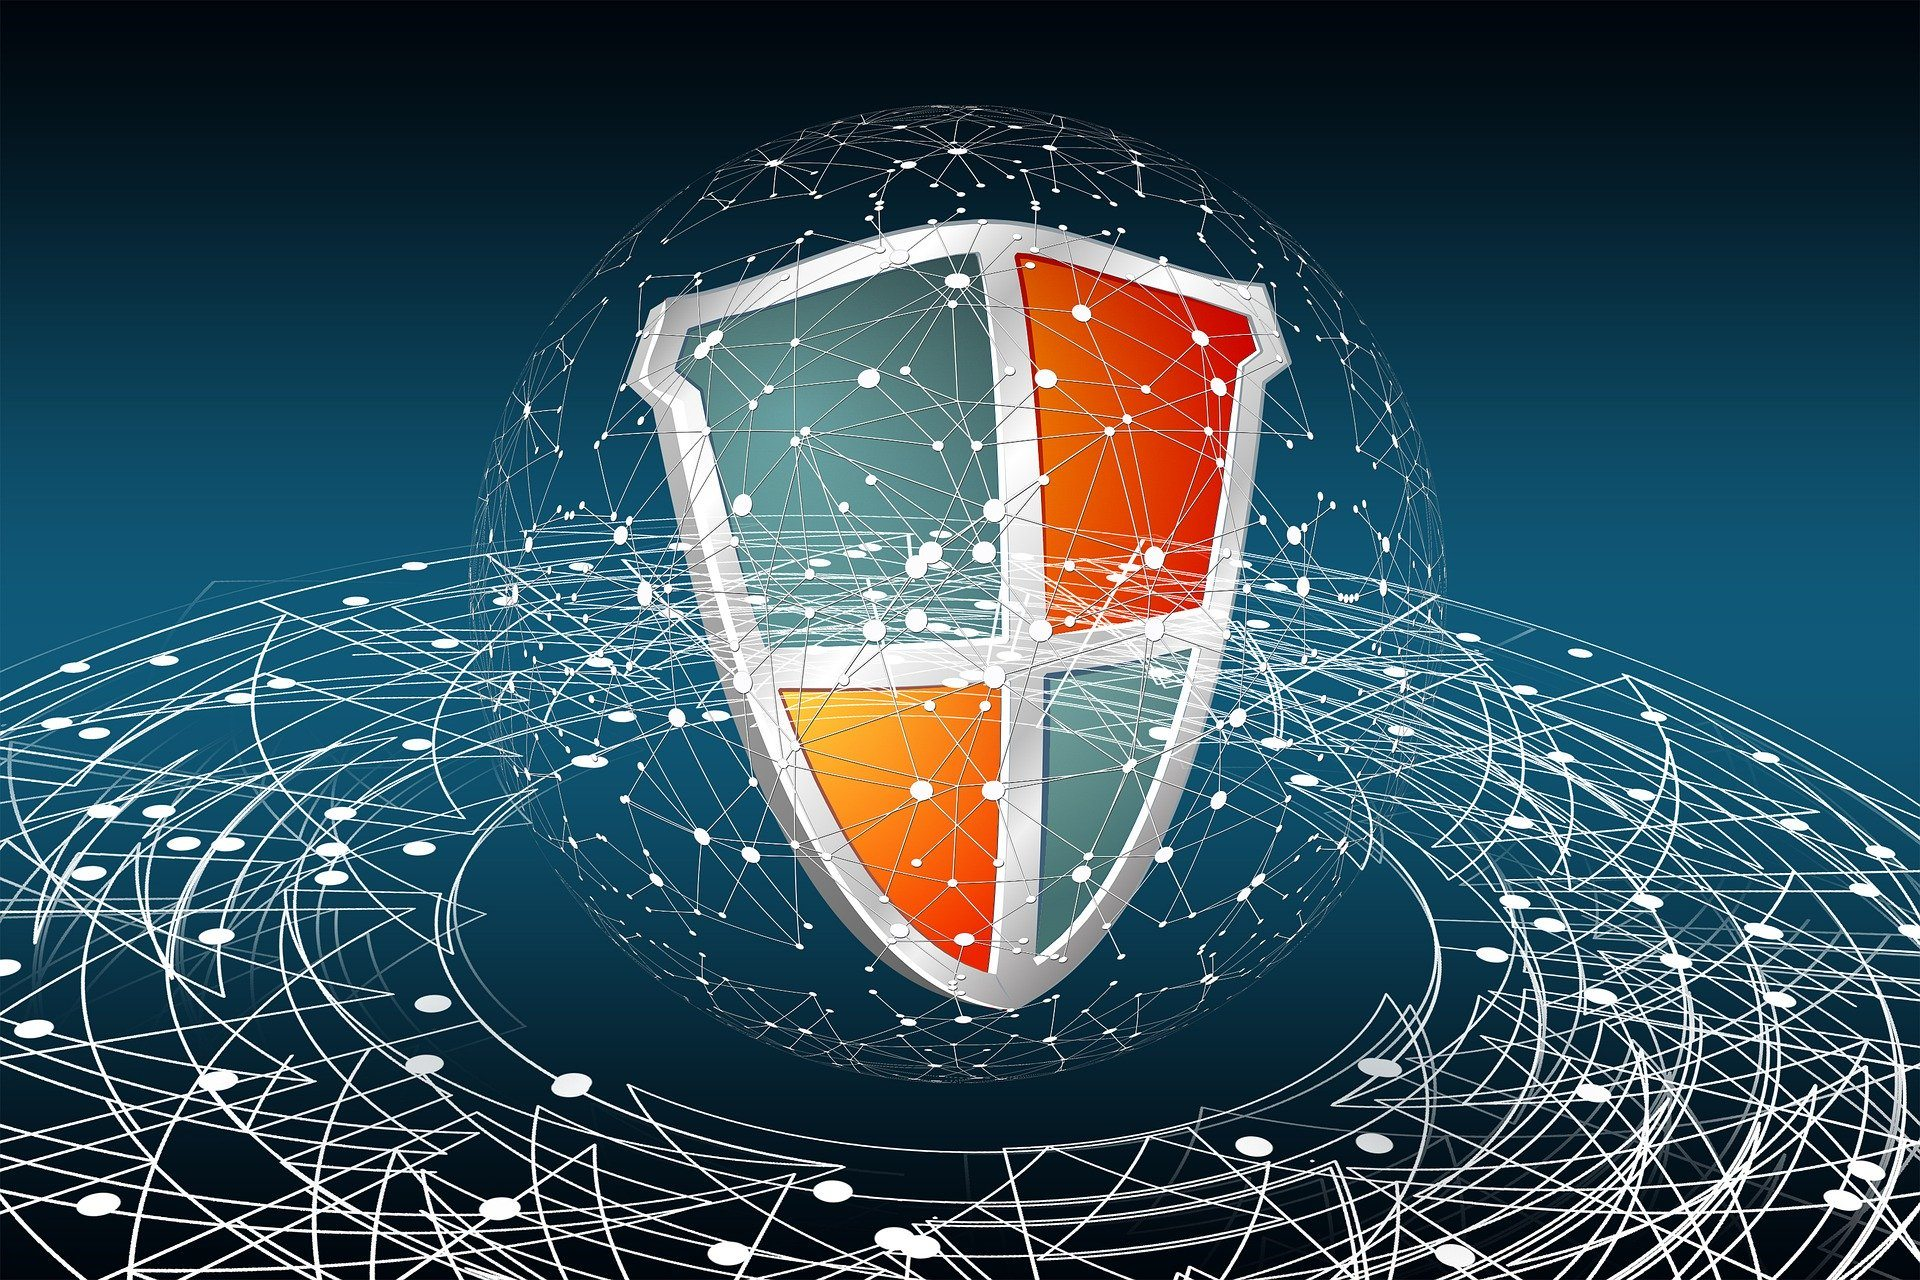 Teamviewer Vulnerability